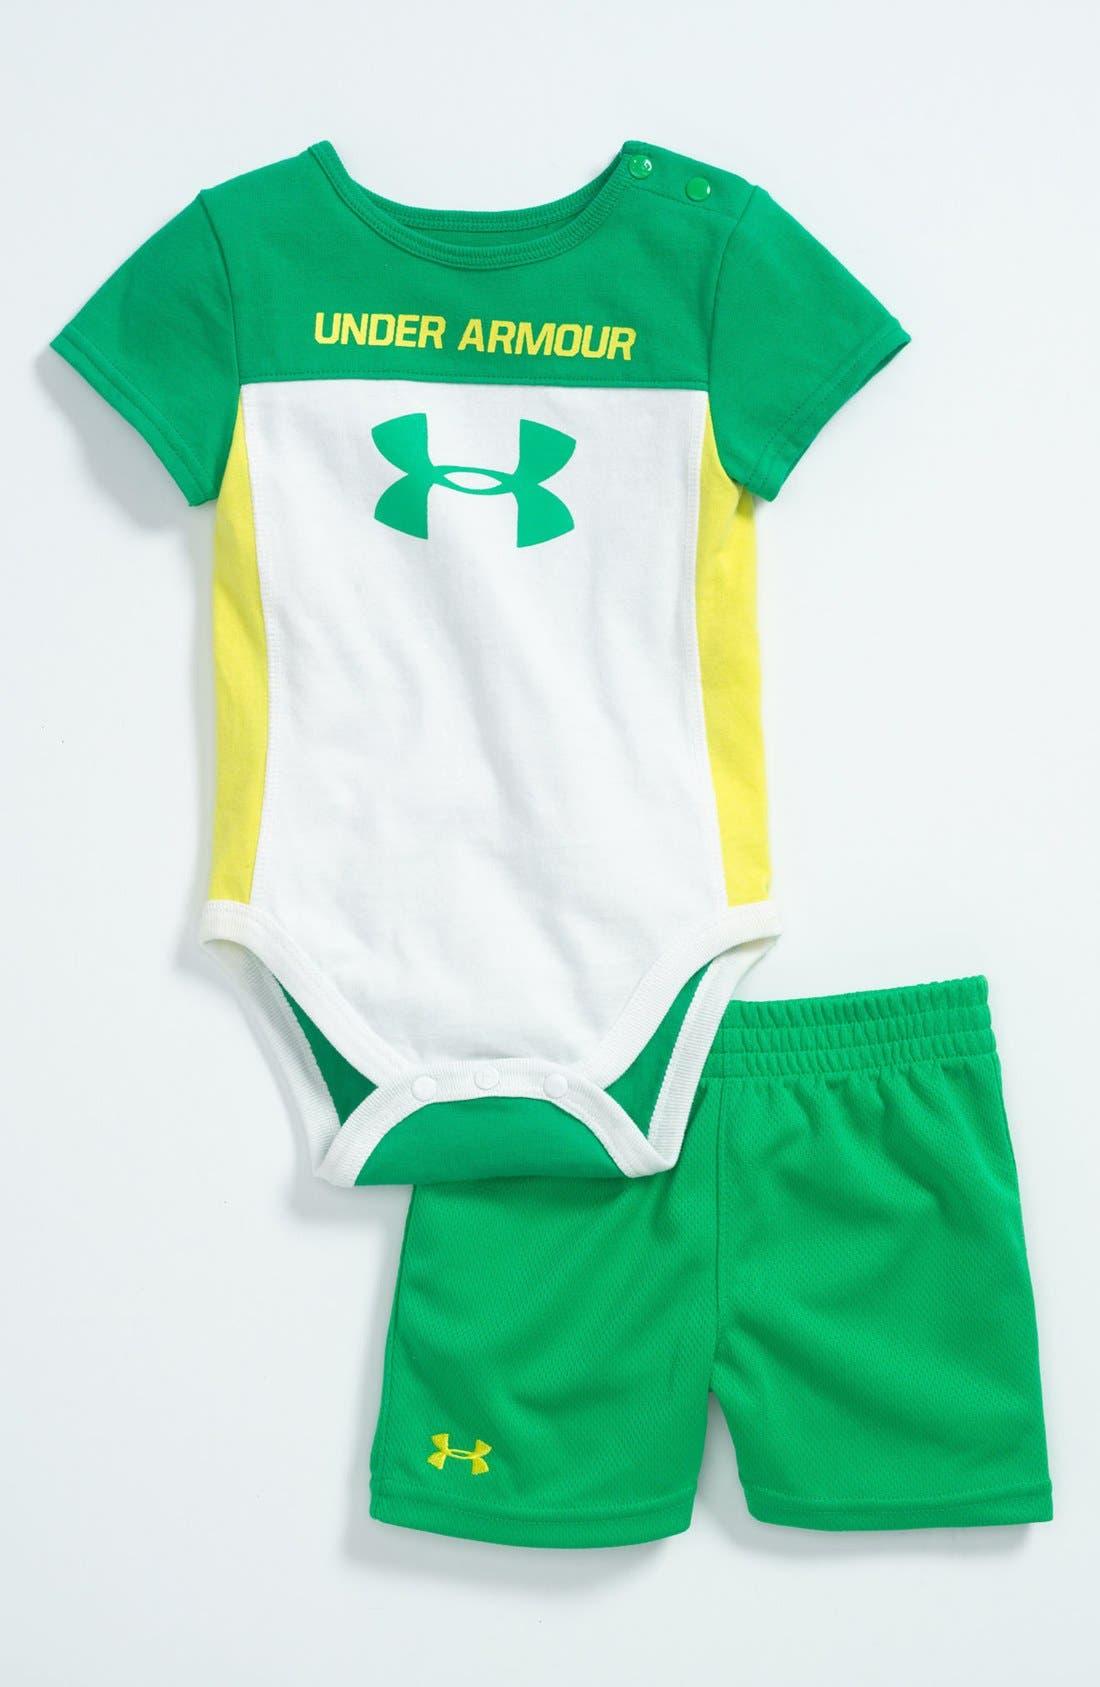 Main Image - Under Armour 'Mixed Media' Bodysuit & Shorts (Baby)